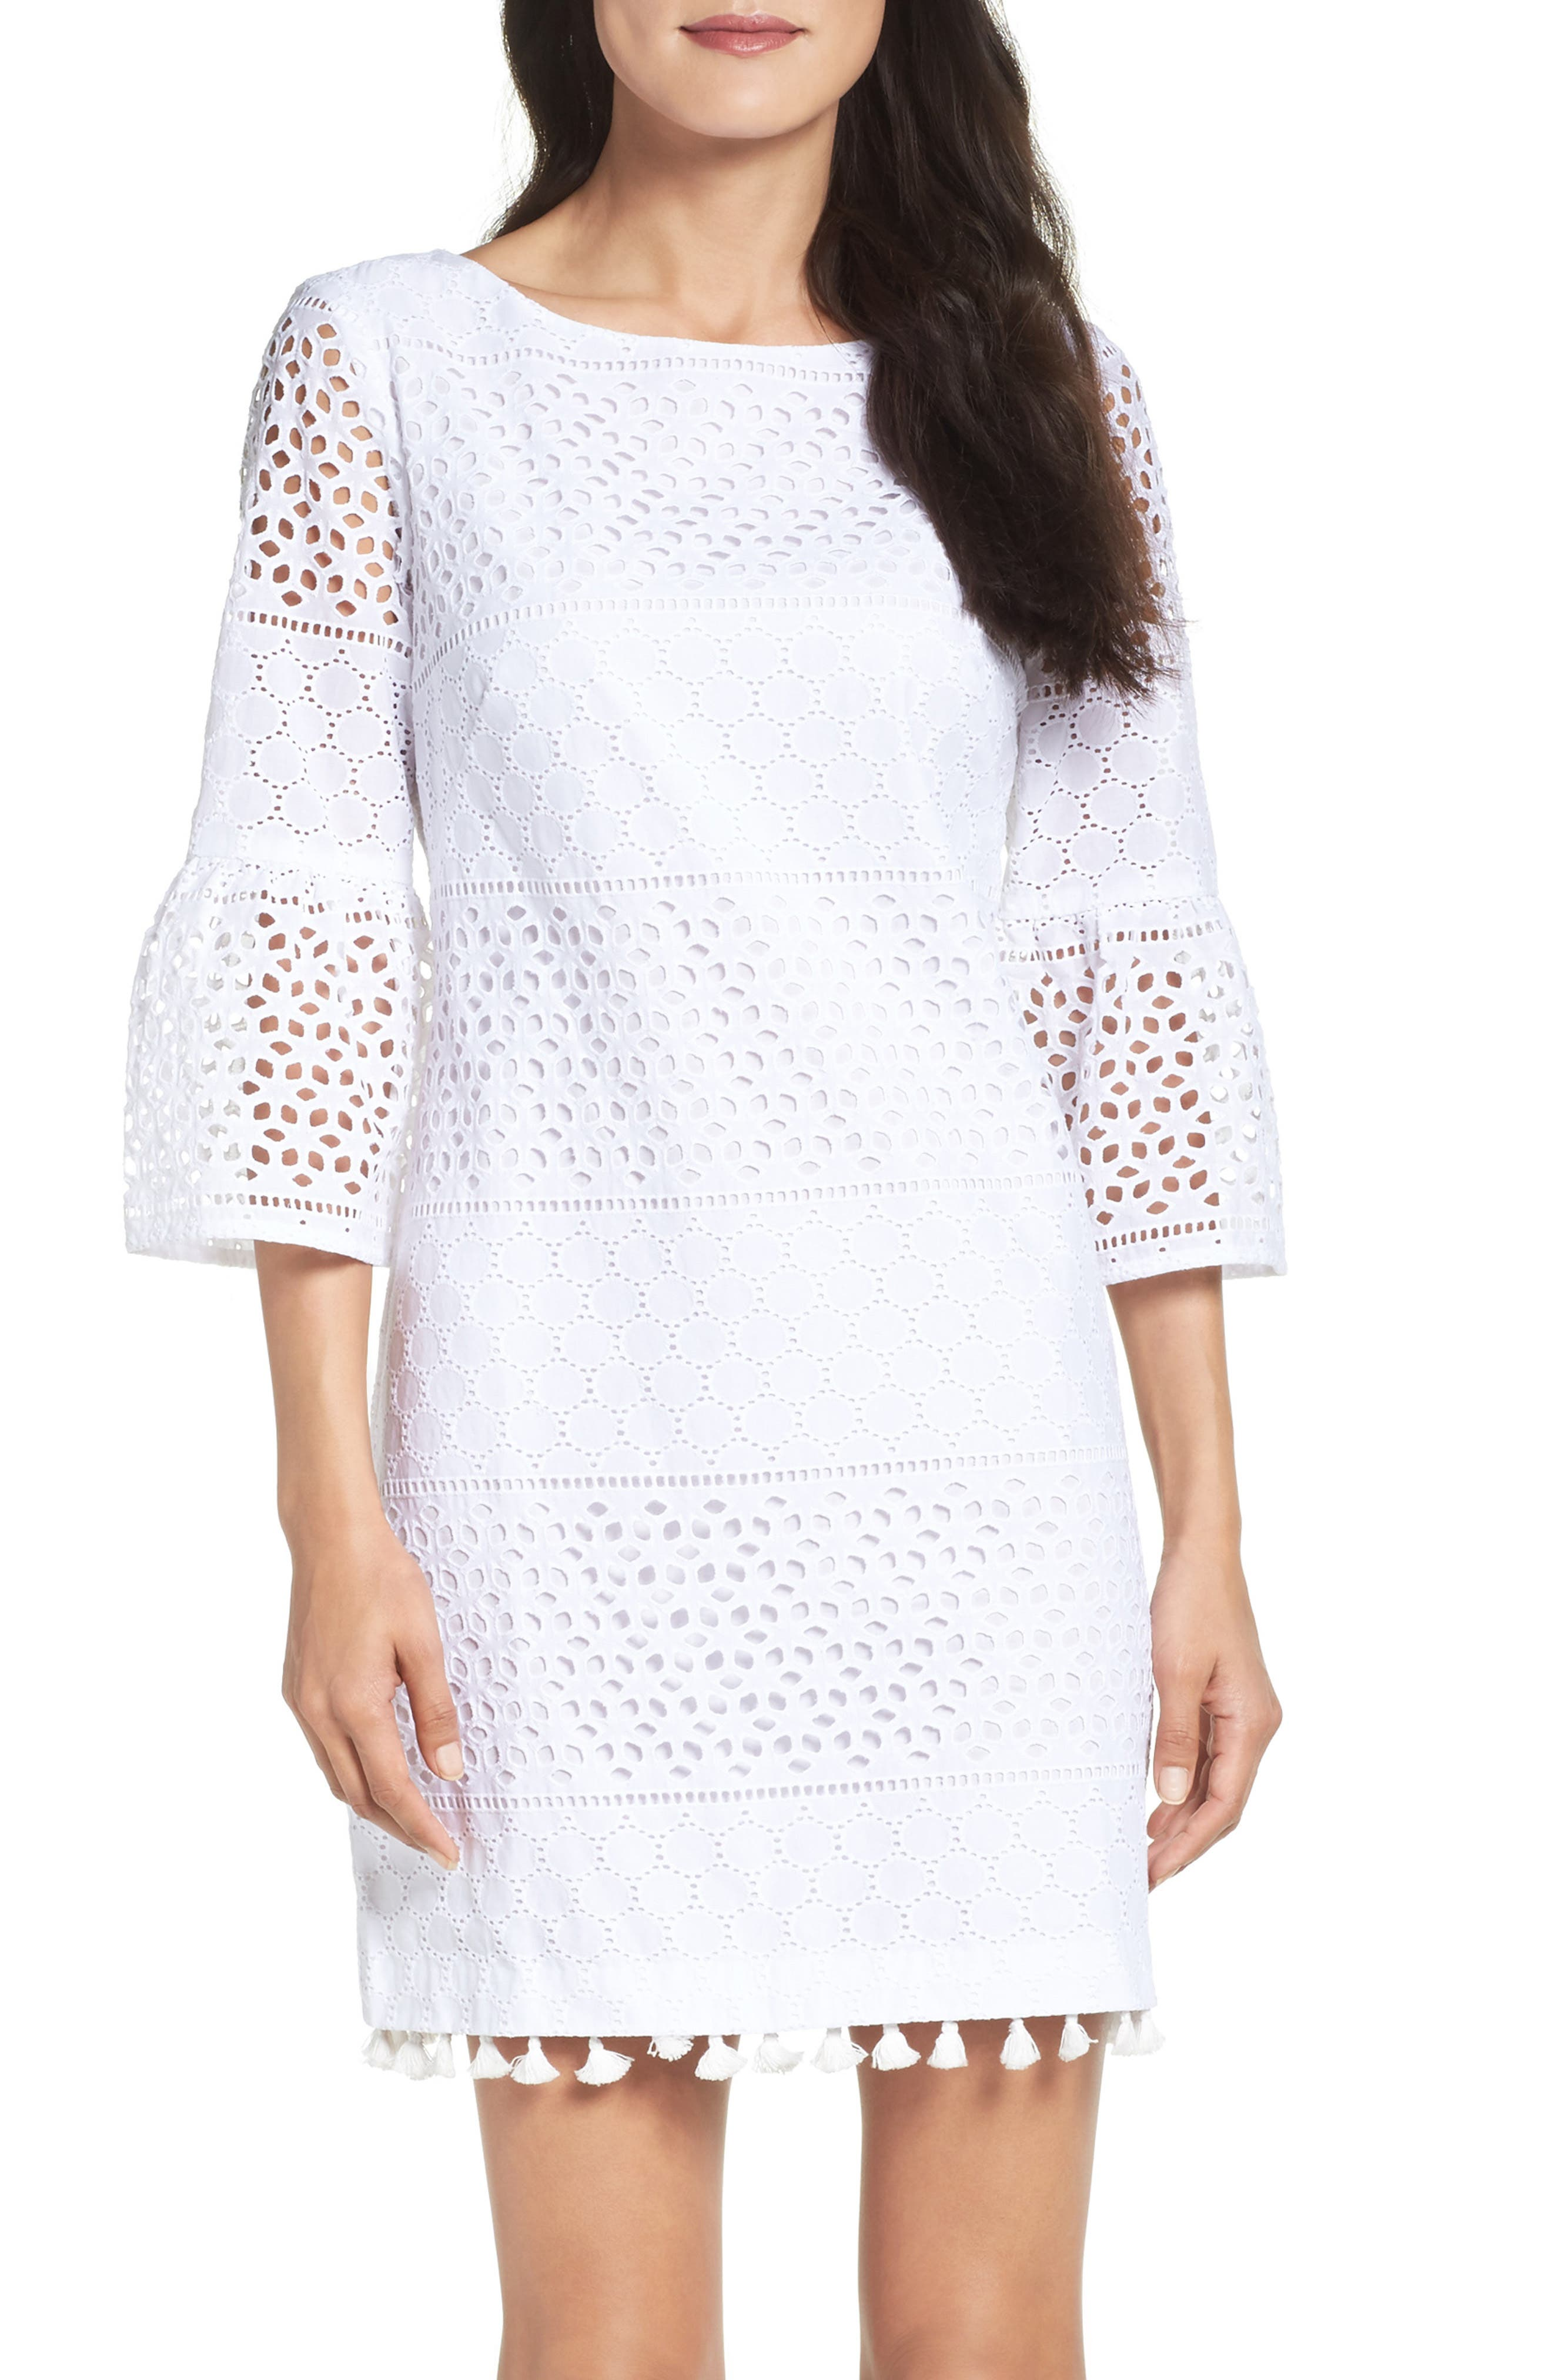 Main Image - Vince Camuto Eyelet A-Line Dress (Regular & Petite)